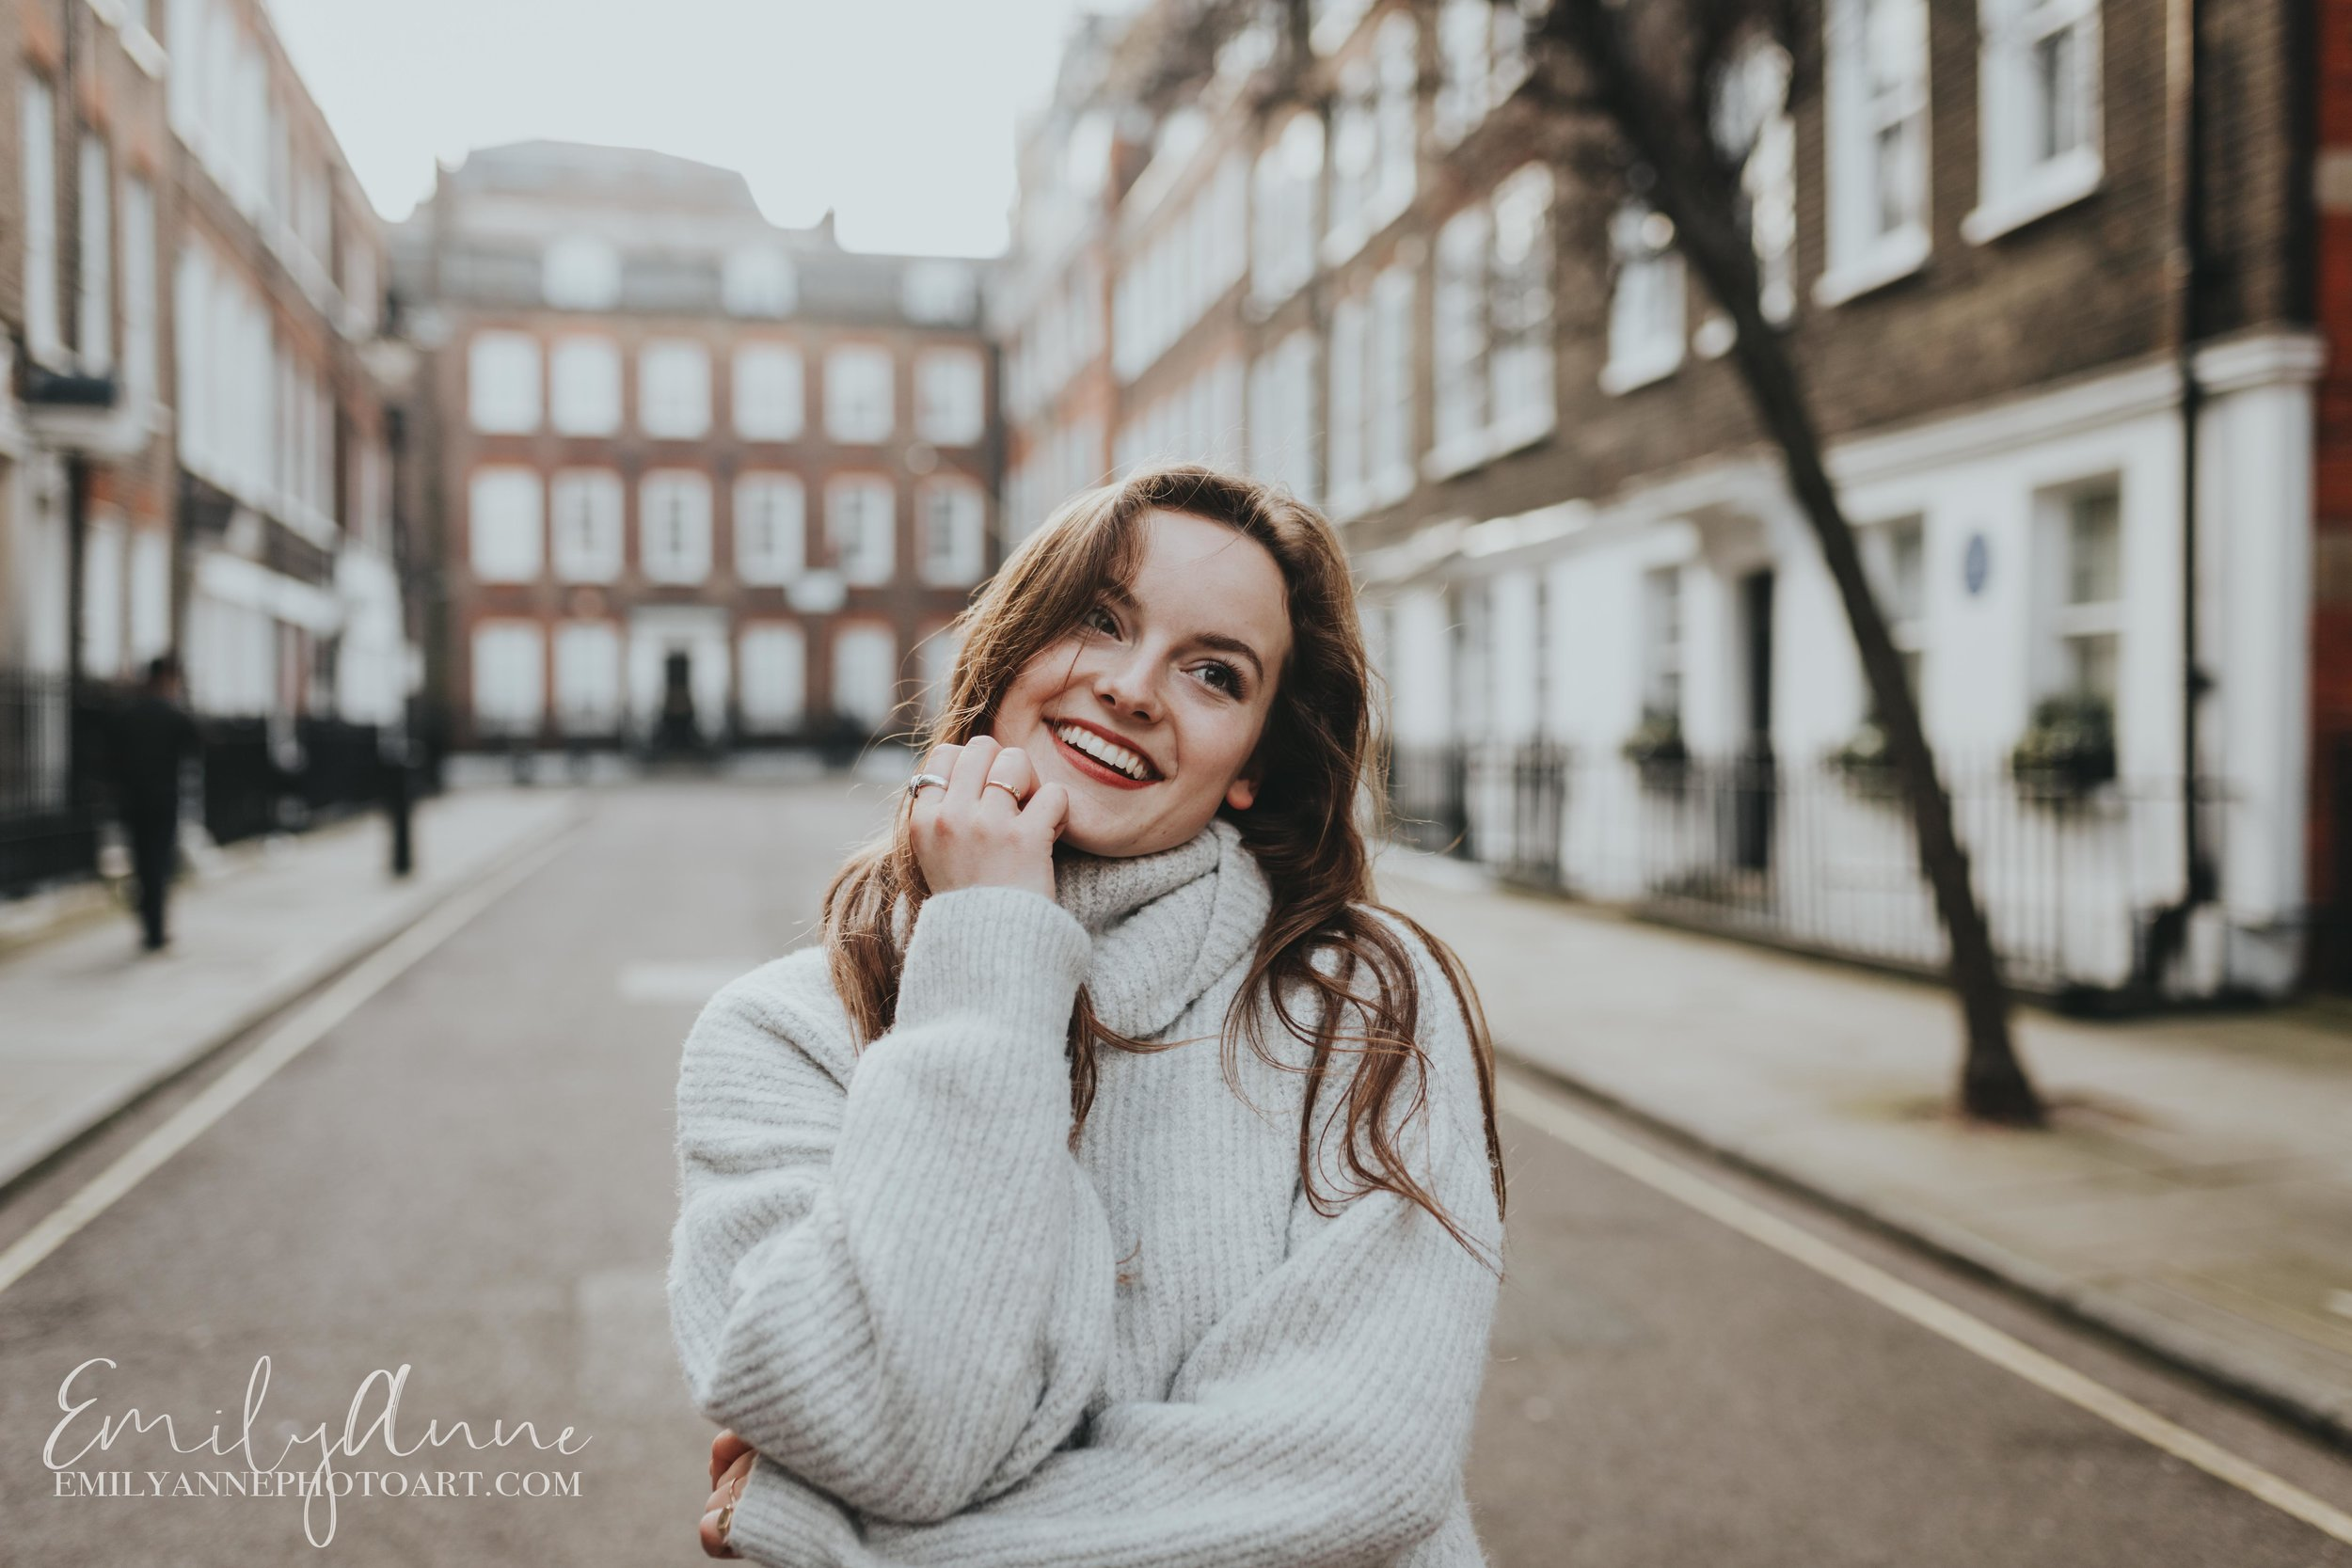 lovely inspiration shots portrait photography emily Anne Nashville and London UK